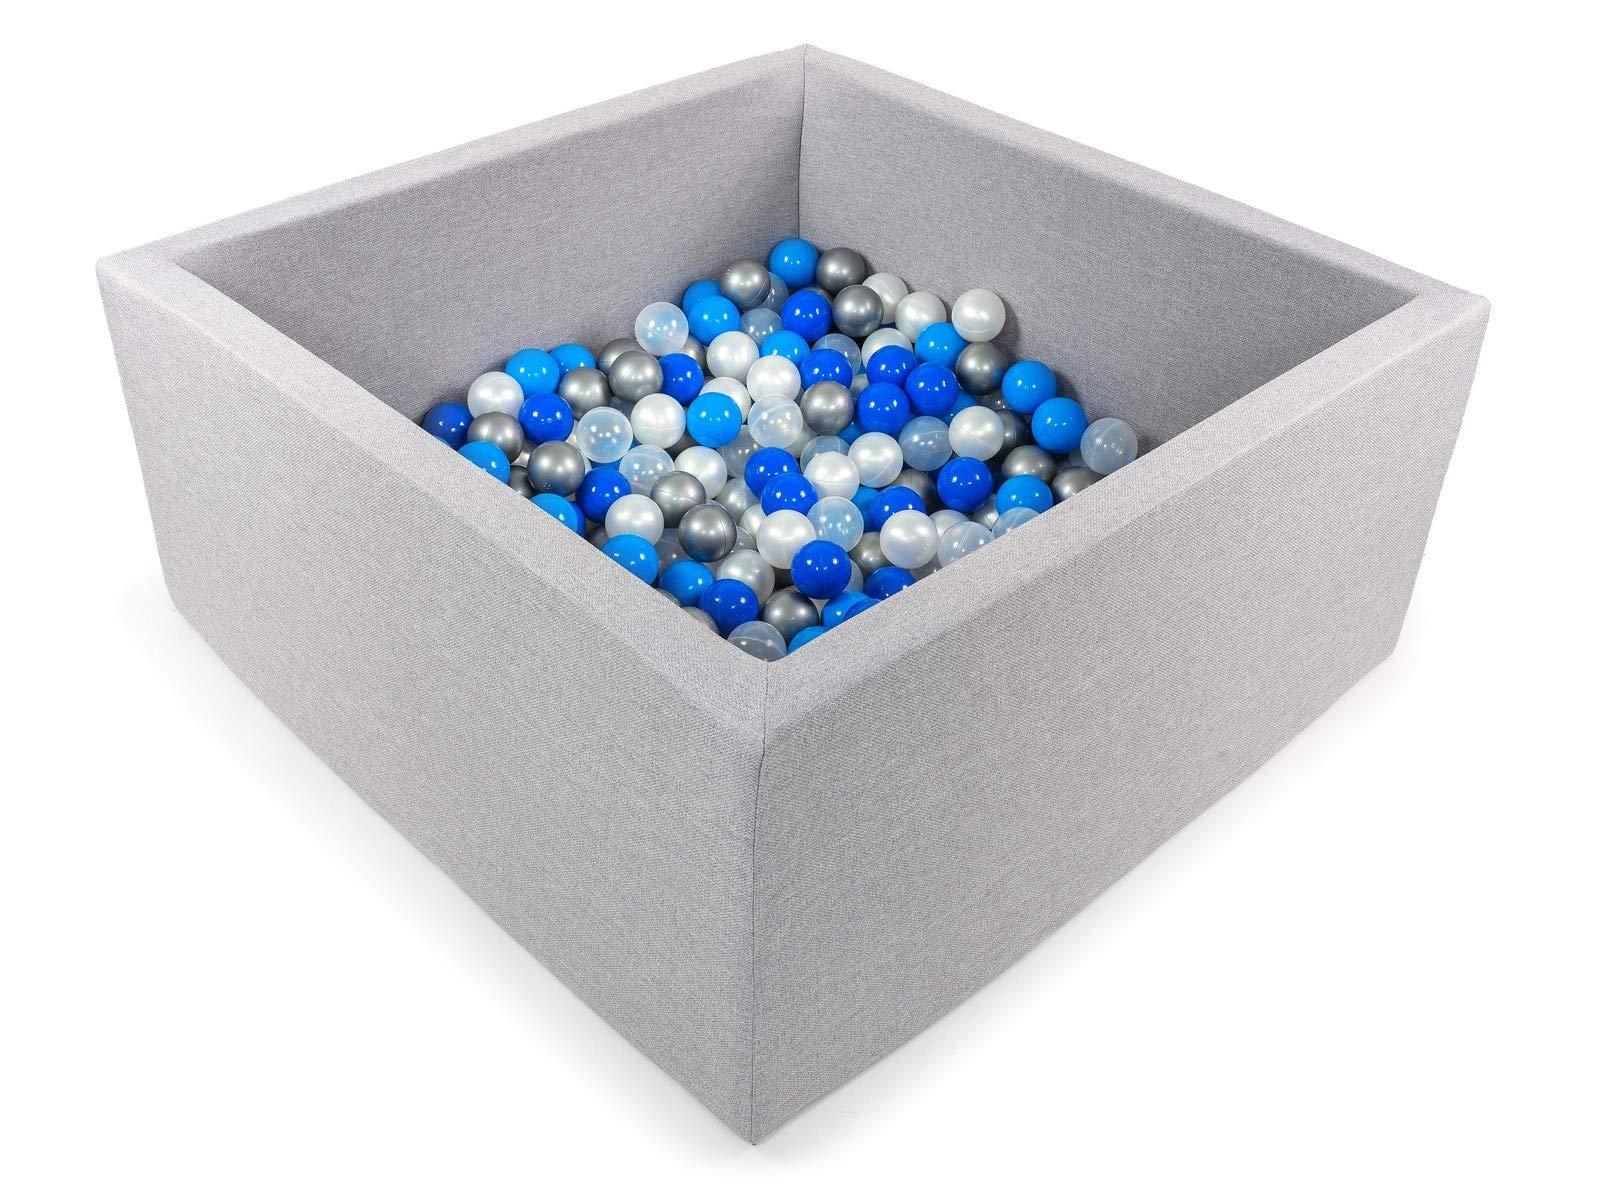 Tweepsy Soft Baby Ball Square Pool Pit 250 Balls 90x90x40cm Handmade EU - BKWZ1